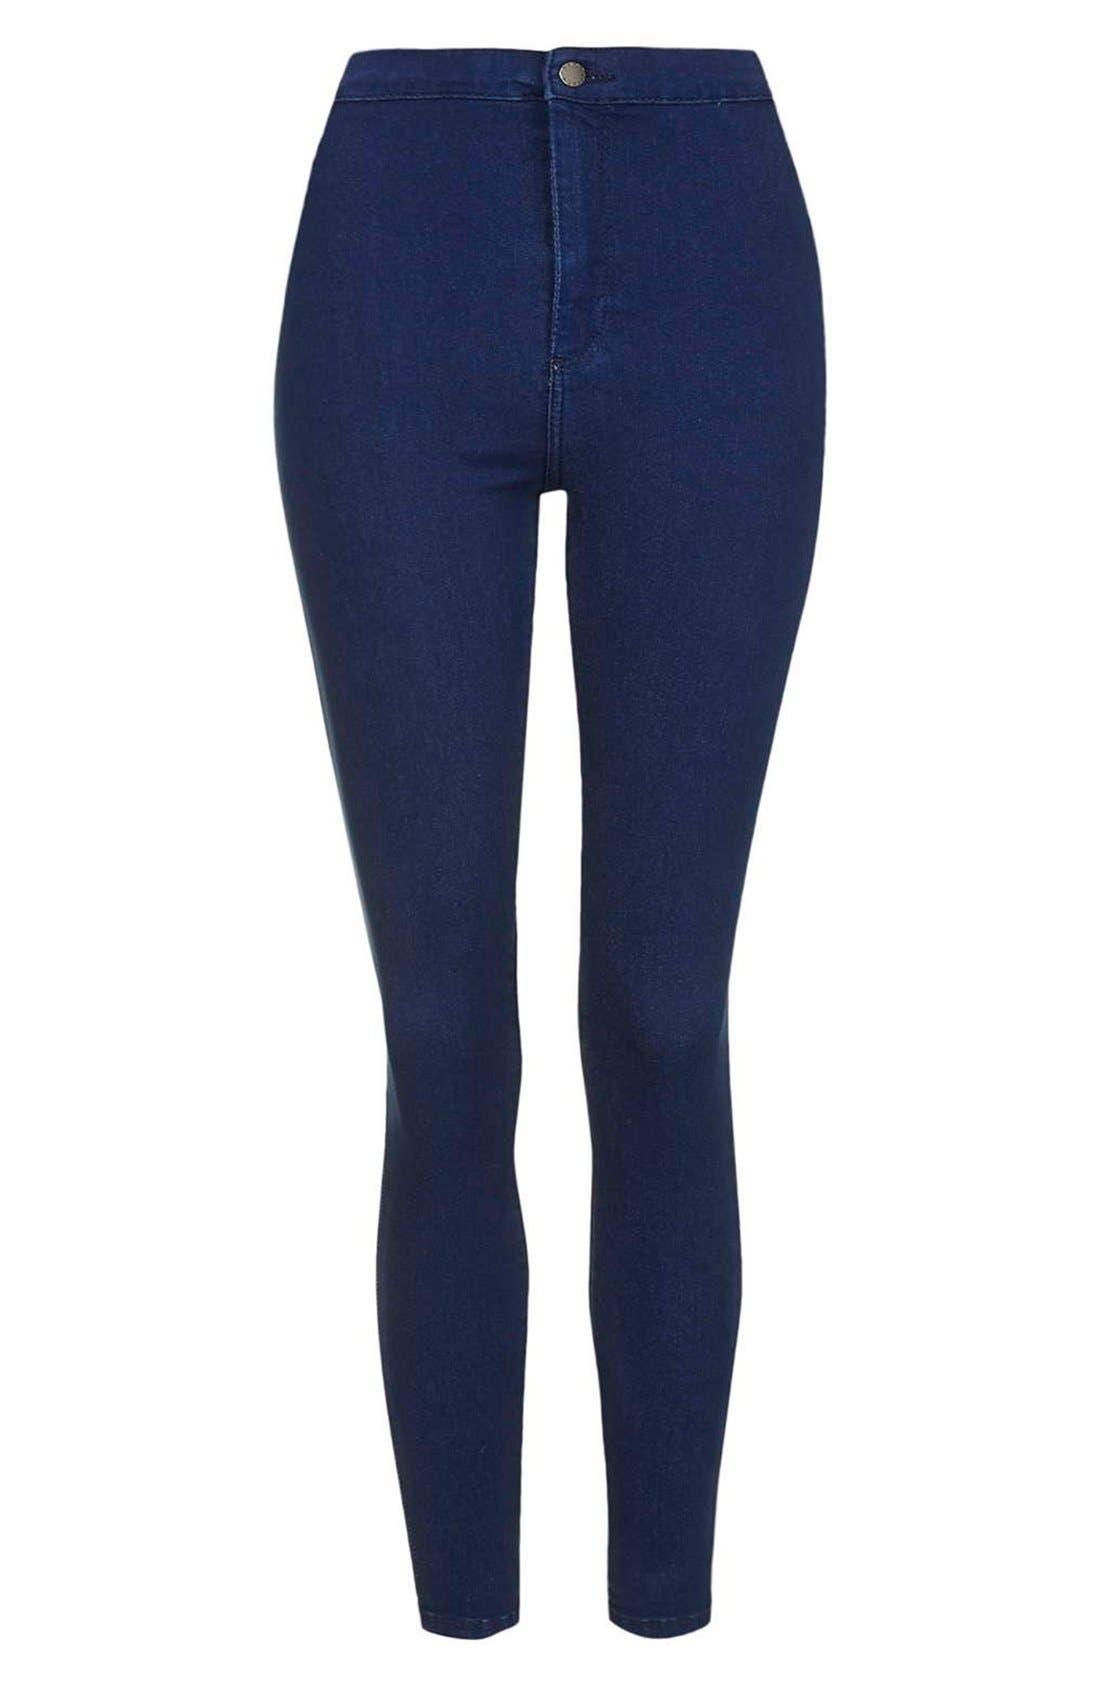 Alternate Image 3  - Topshop Moto 'Joni' Ankle Skinny Jeans (Bright Blue) (Petite)